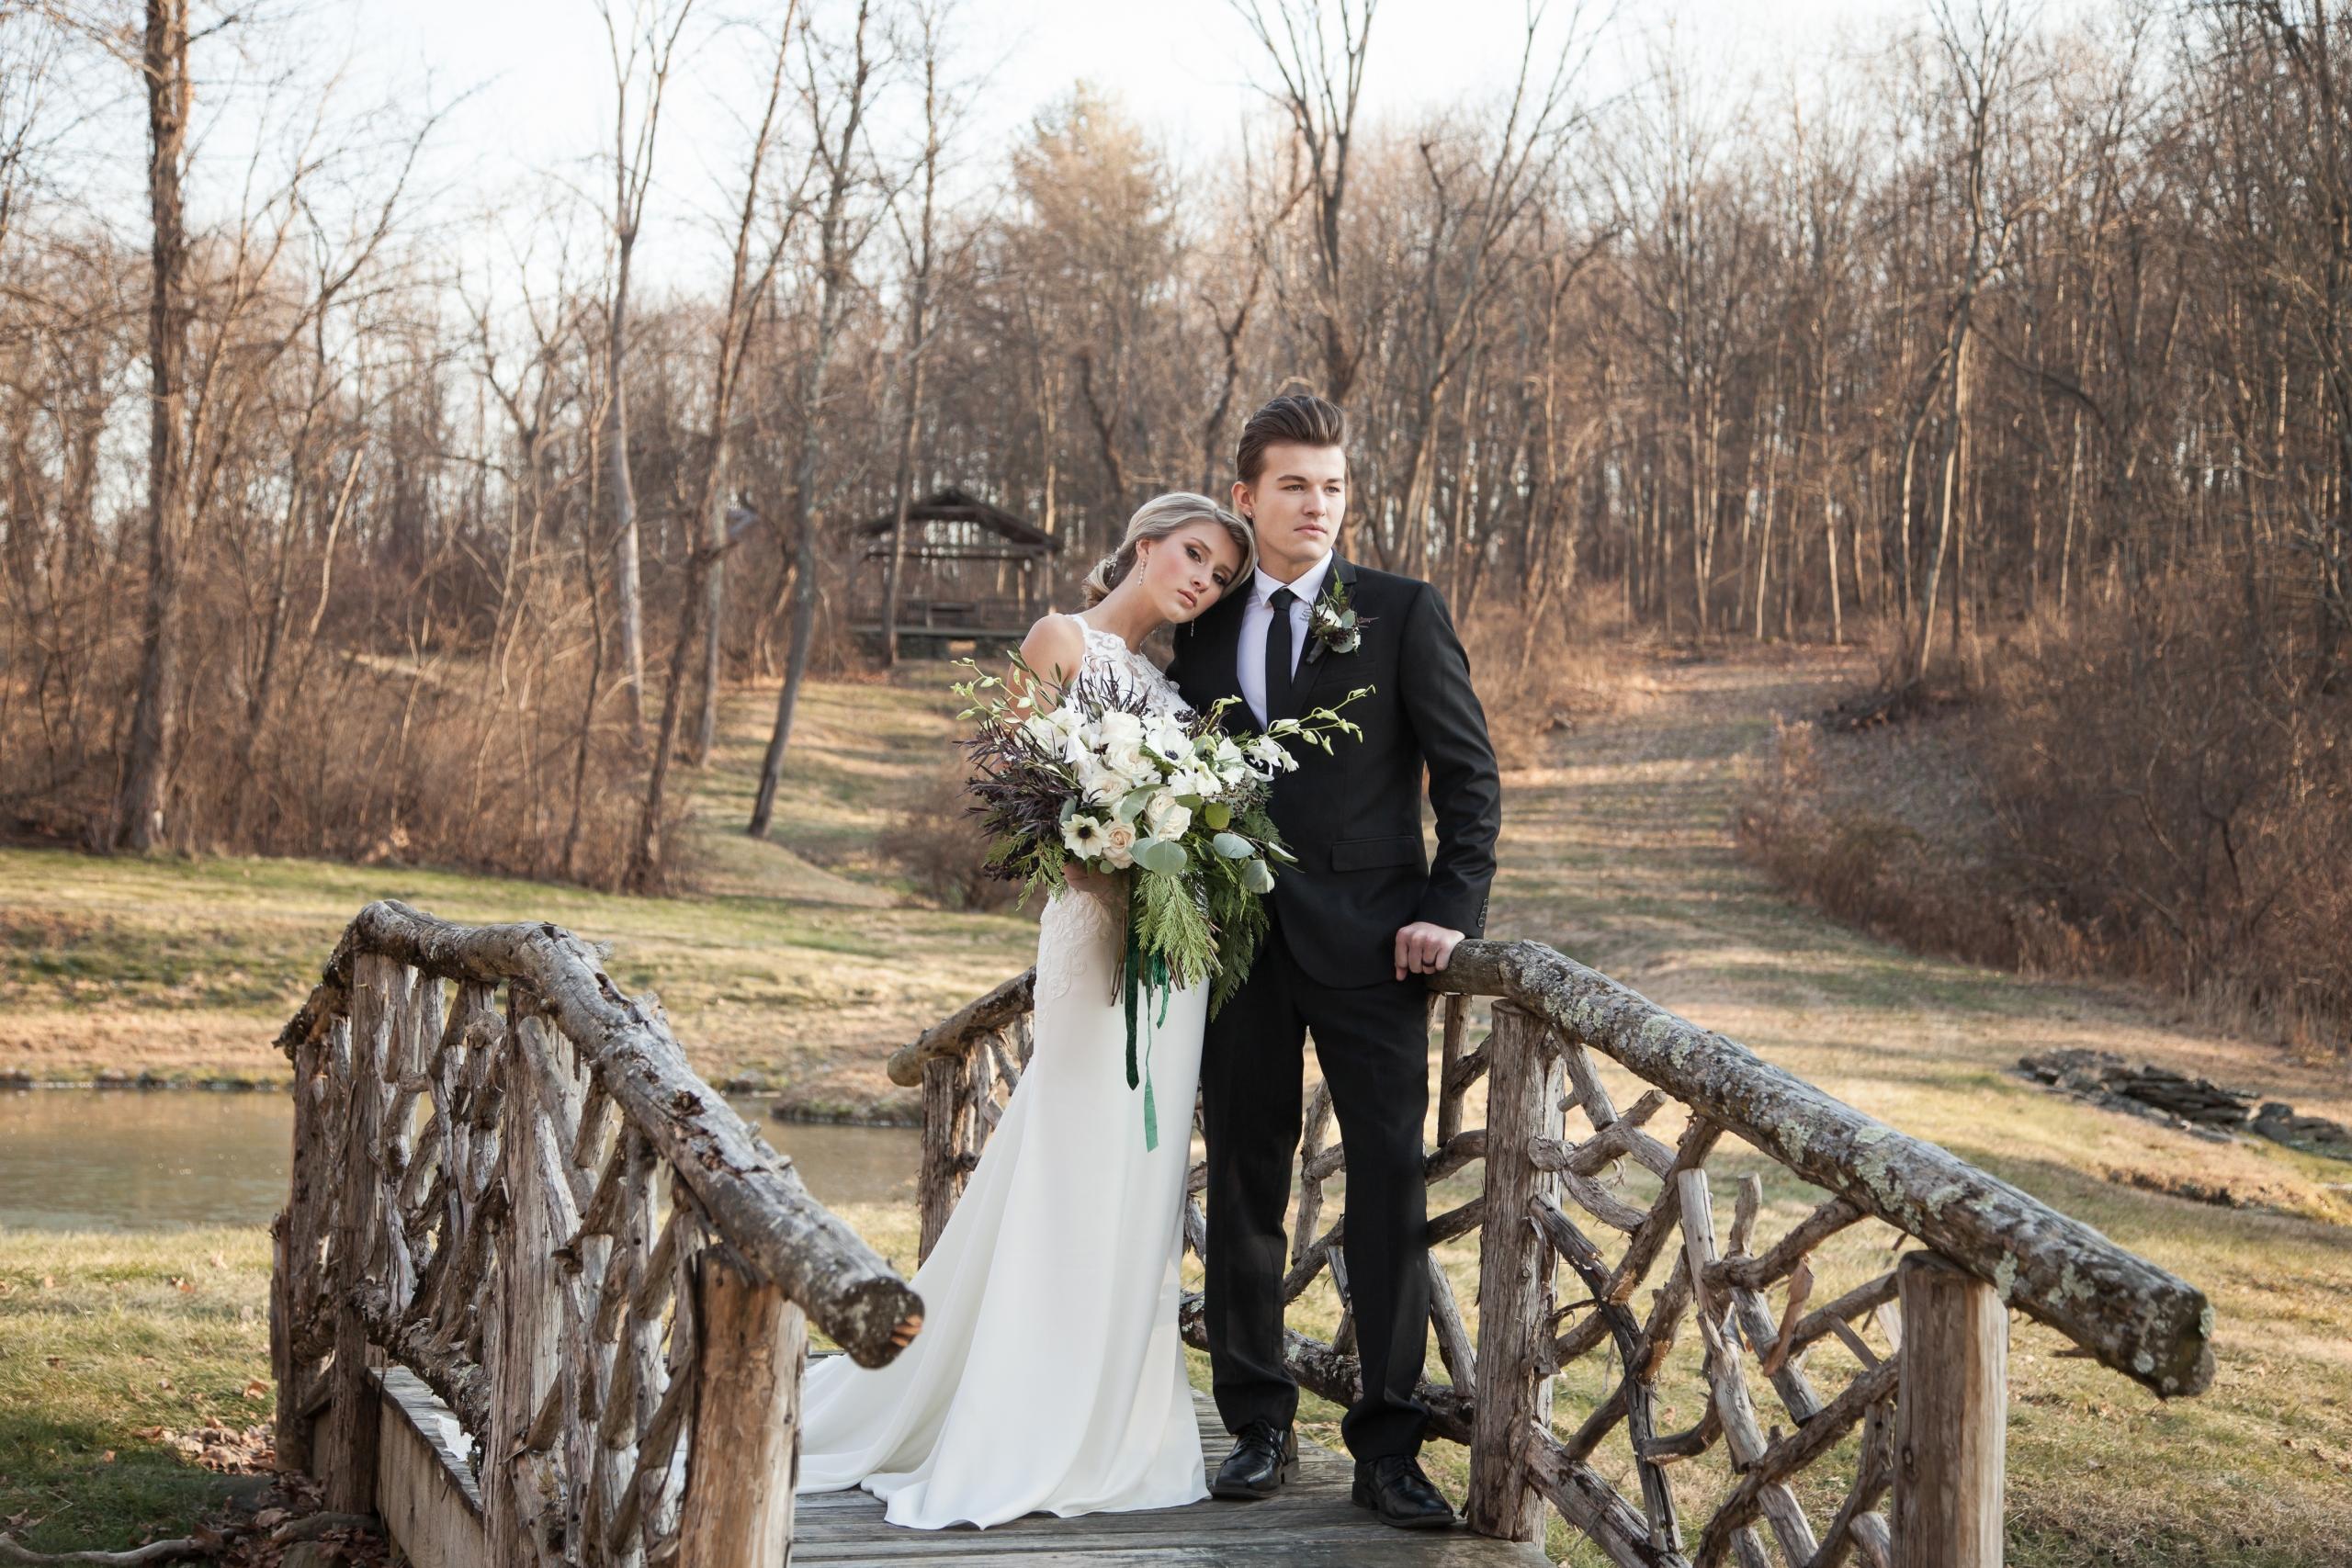 ny wedding planning tips pandemic